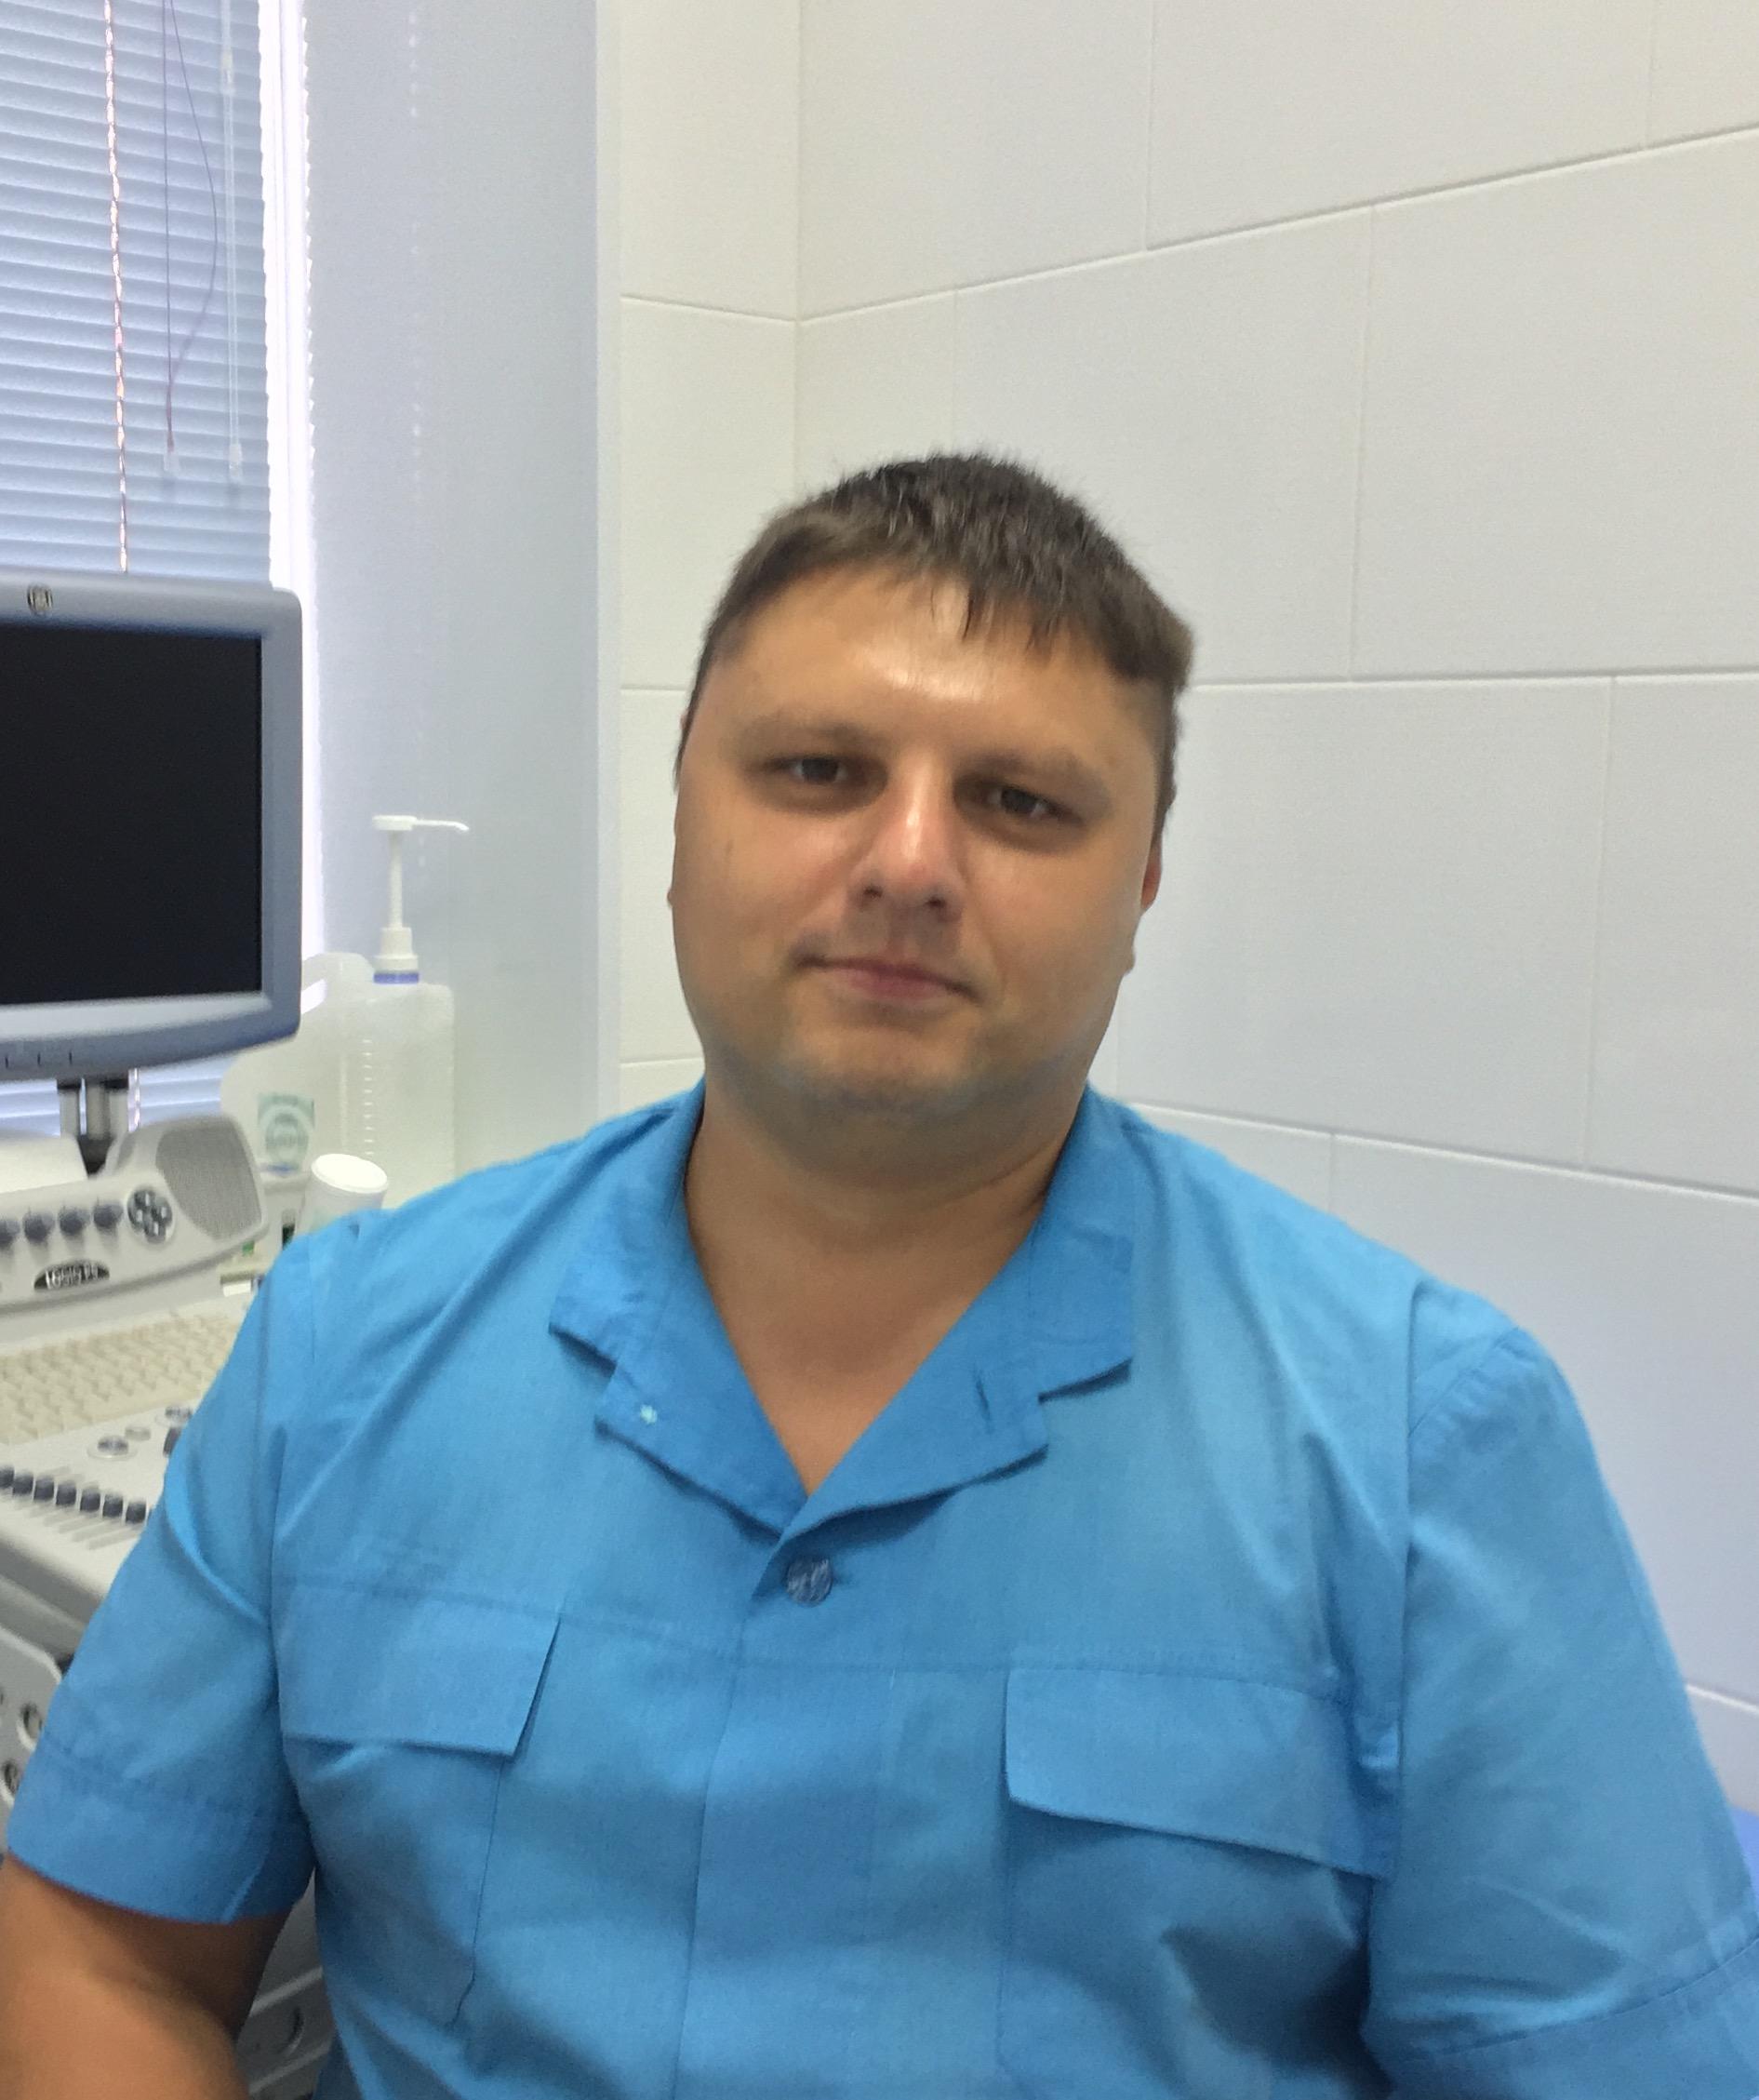 Крячков Алексей Васильевич – врач-невролог